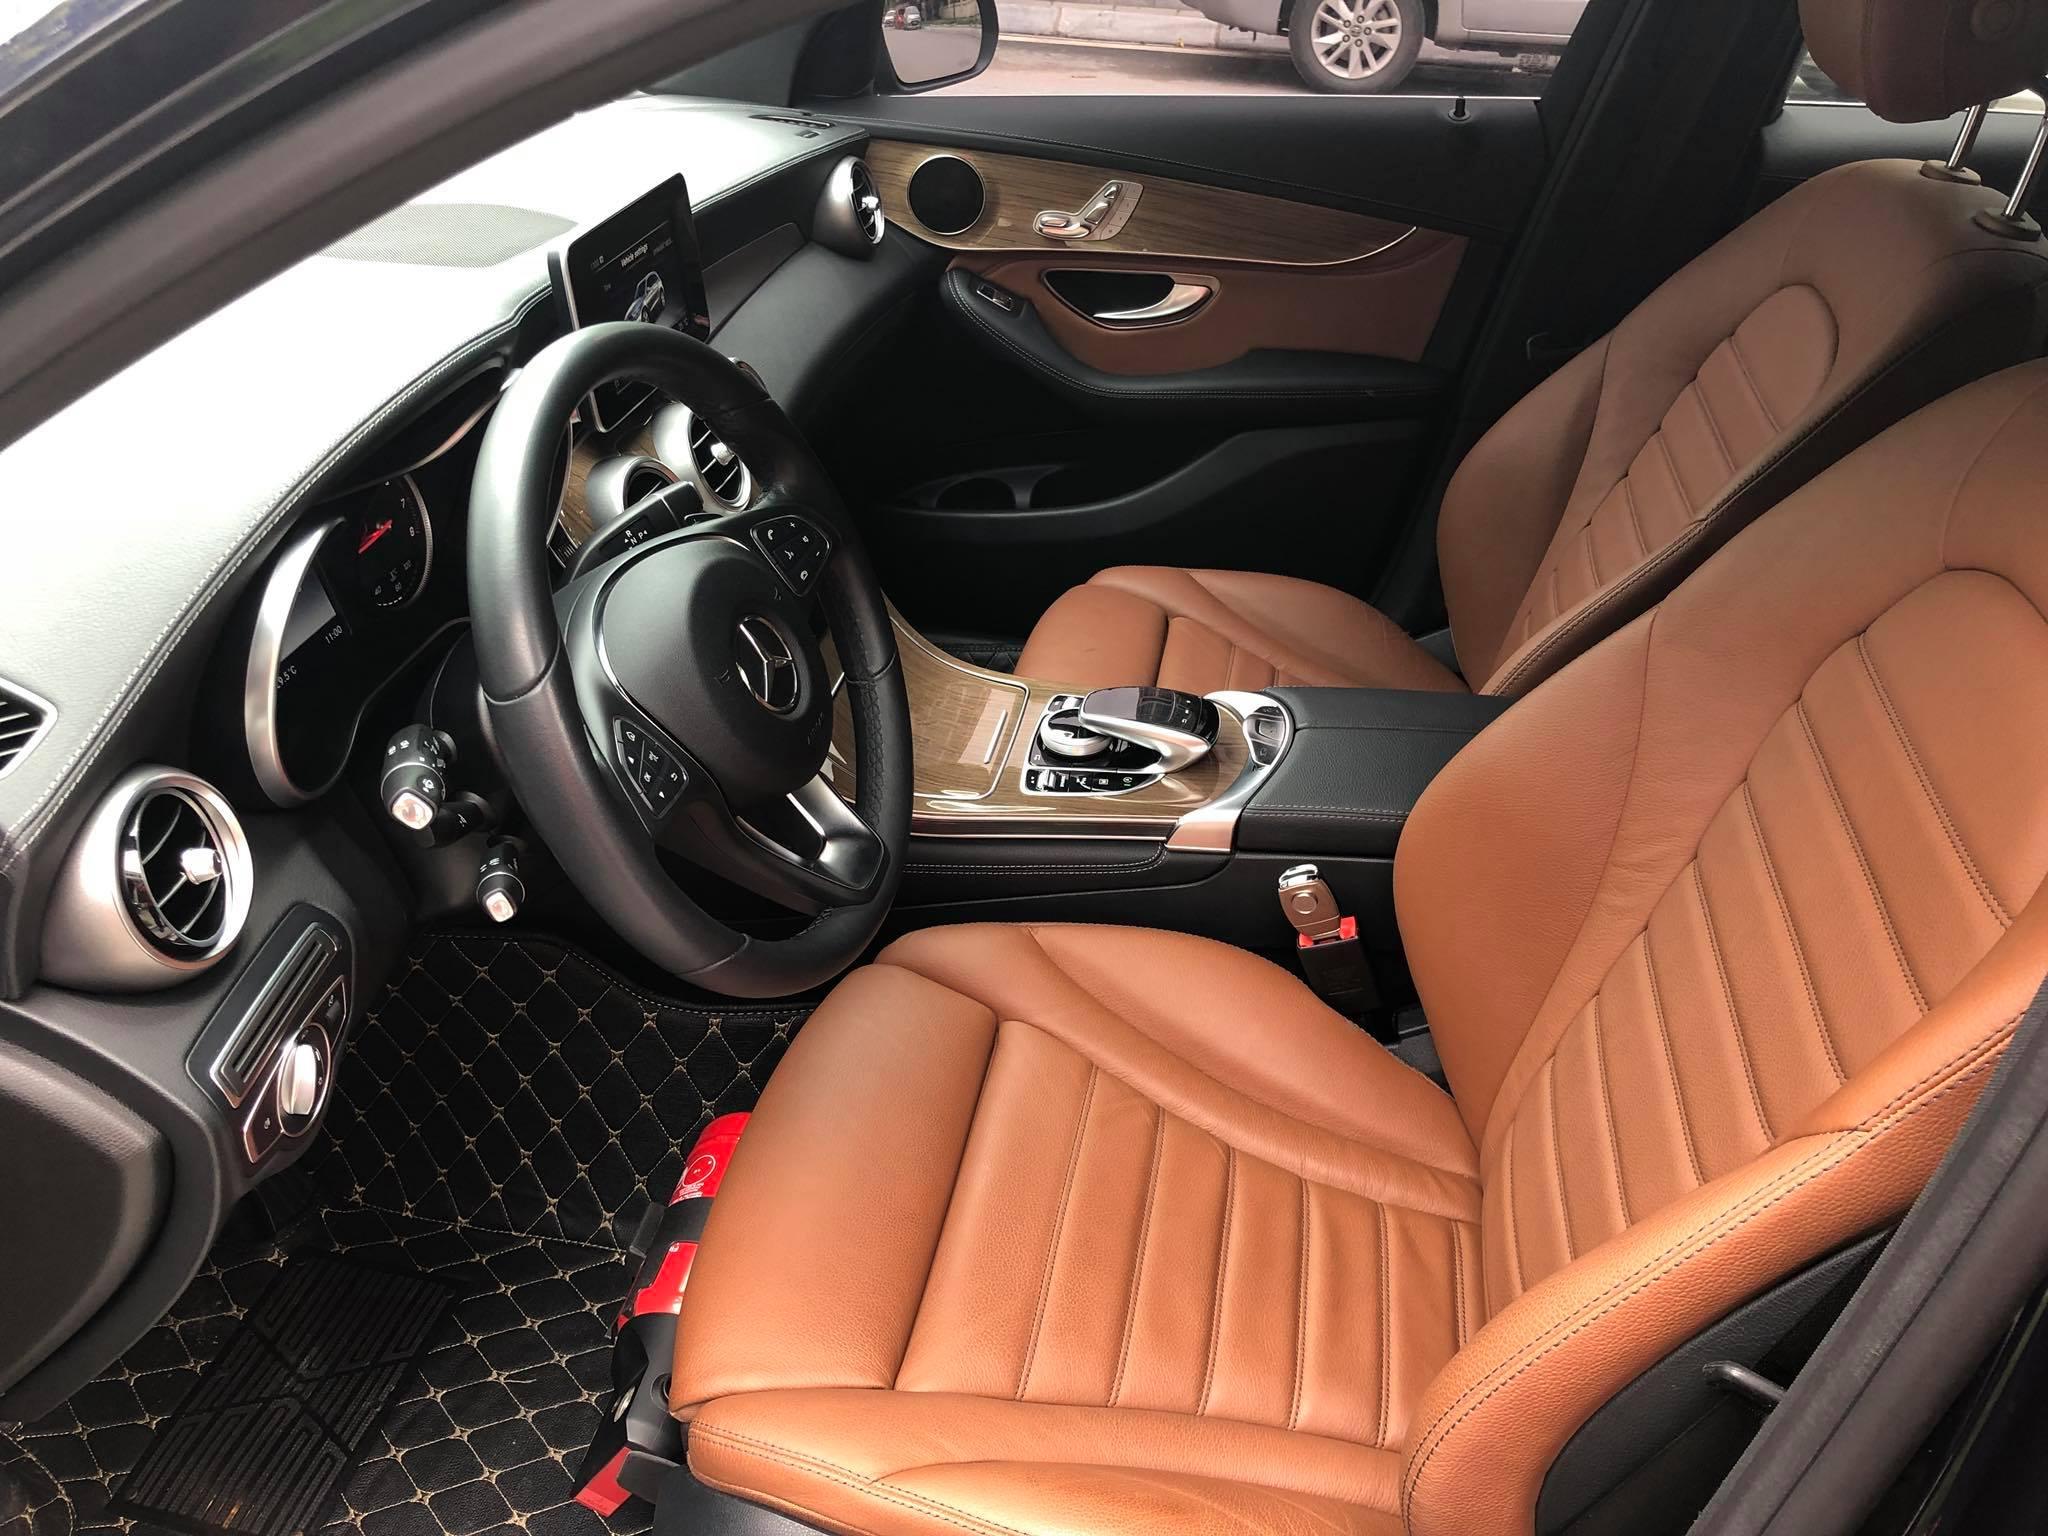 Mercedes Benz GLC250 2016 30E-935.xx